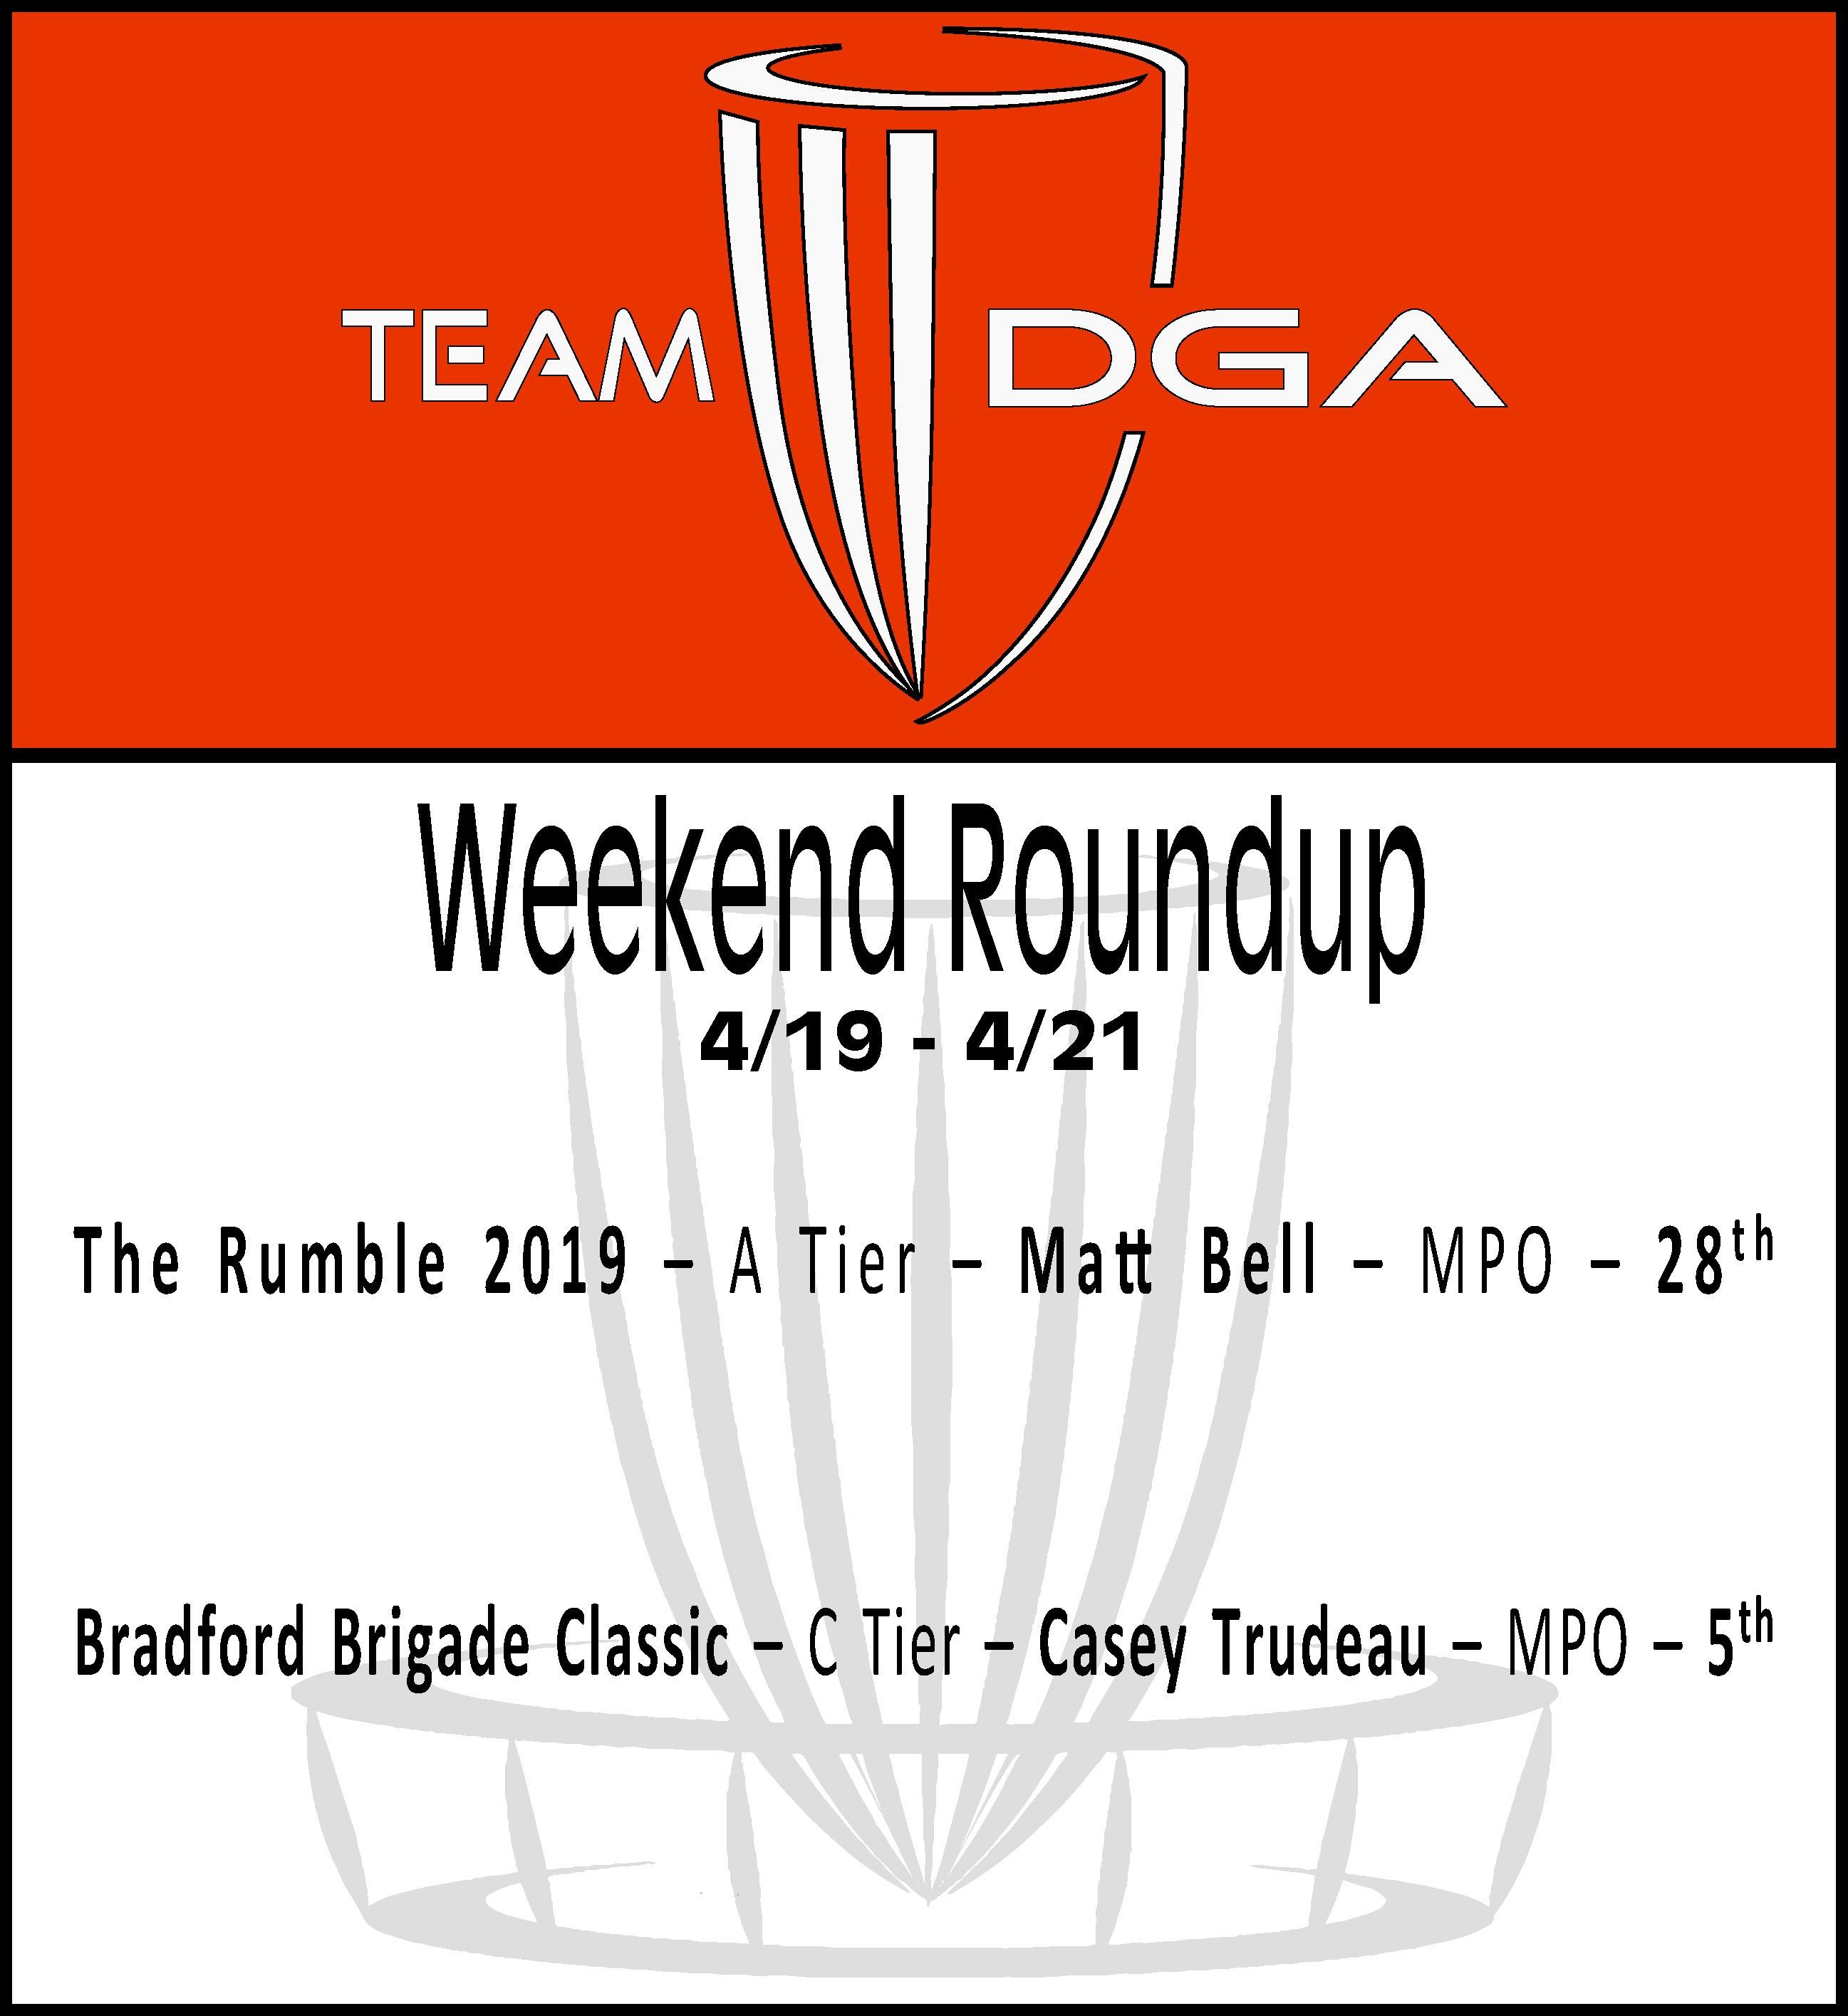 Team DGA Weekend Roundup 4/19 - 4/21